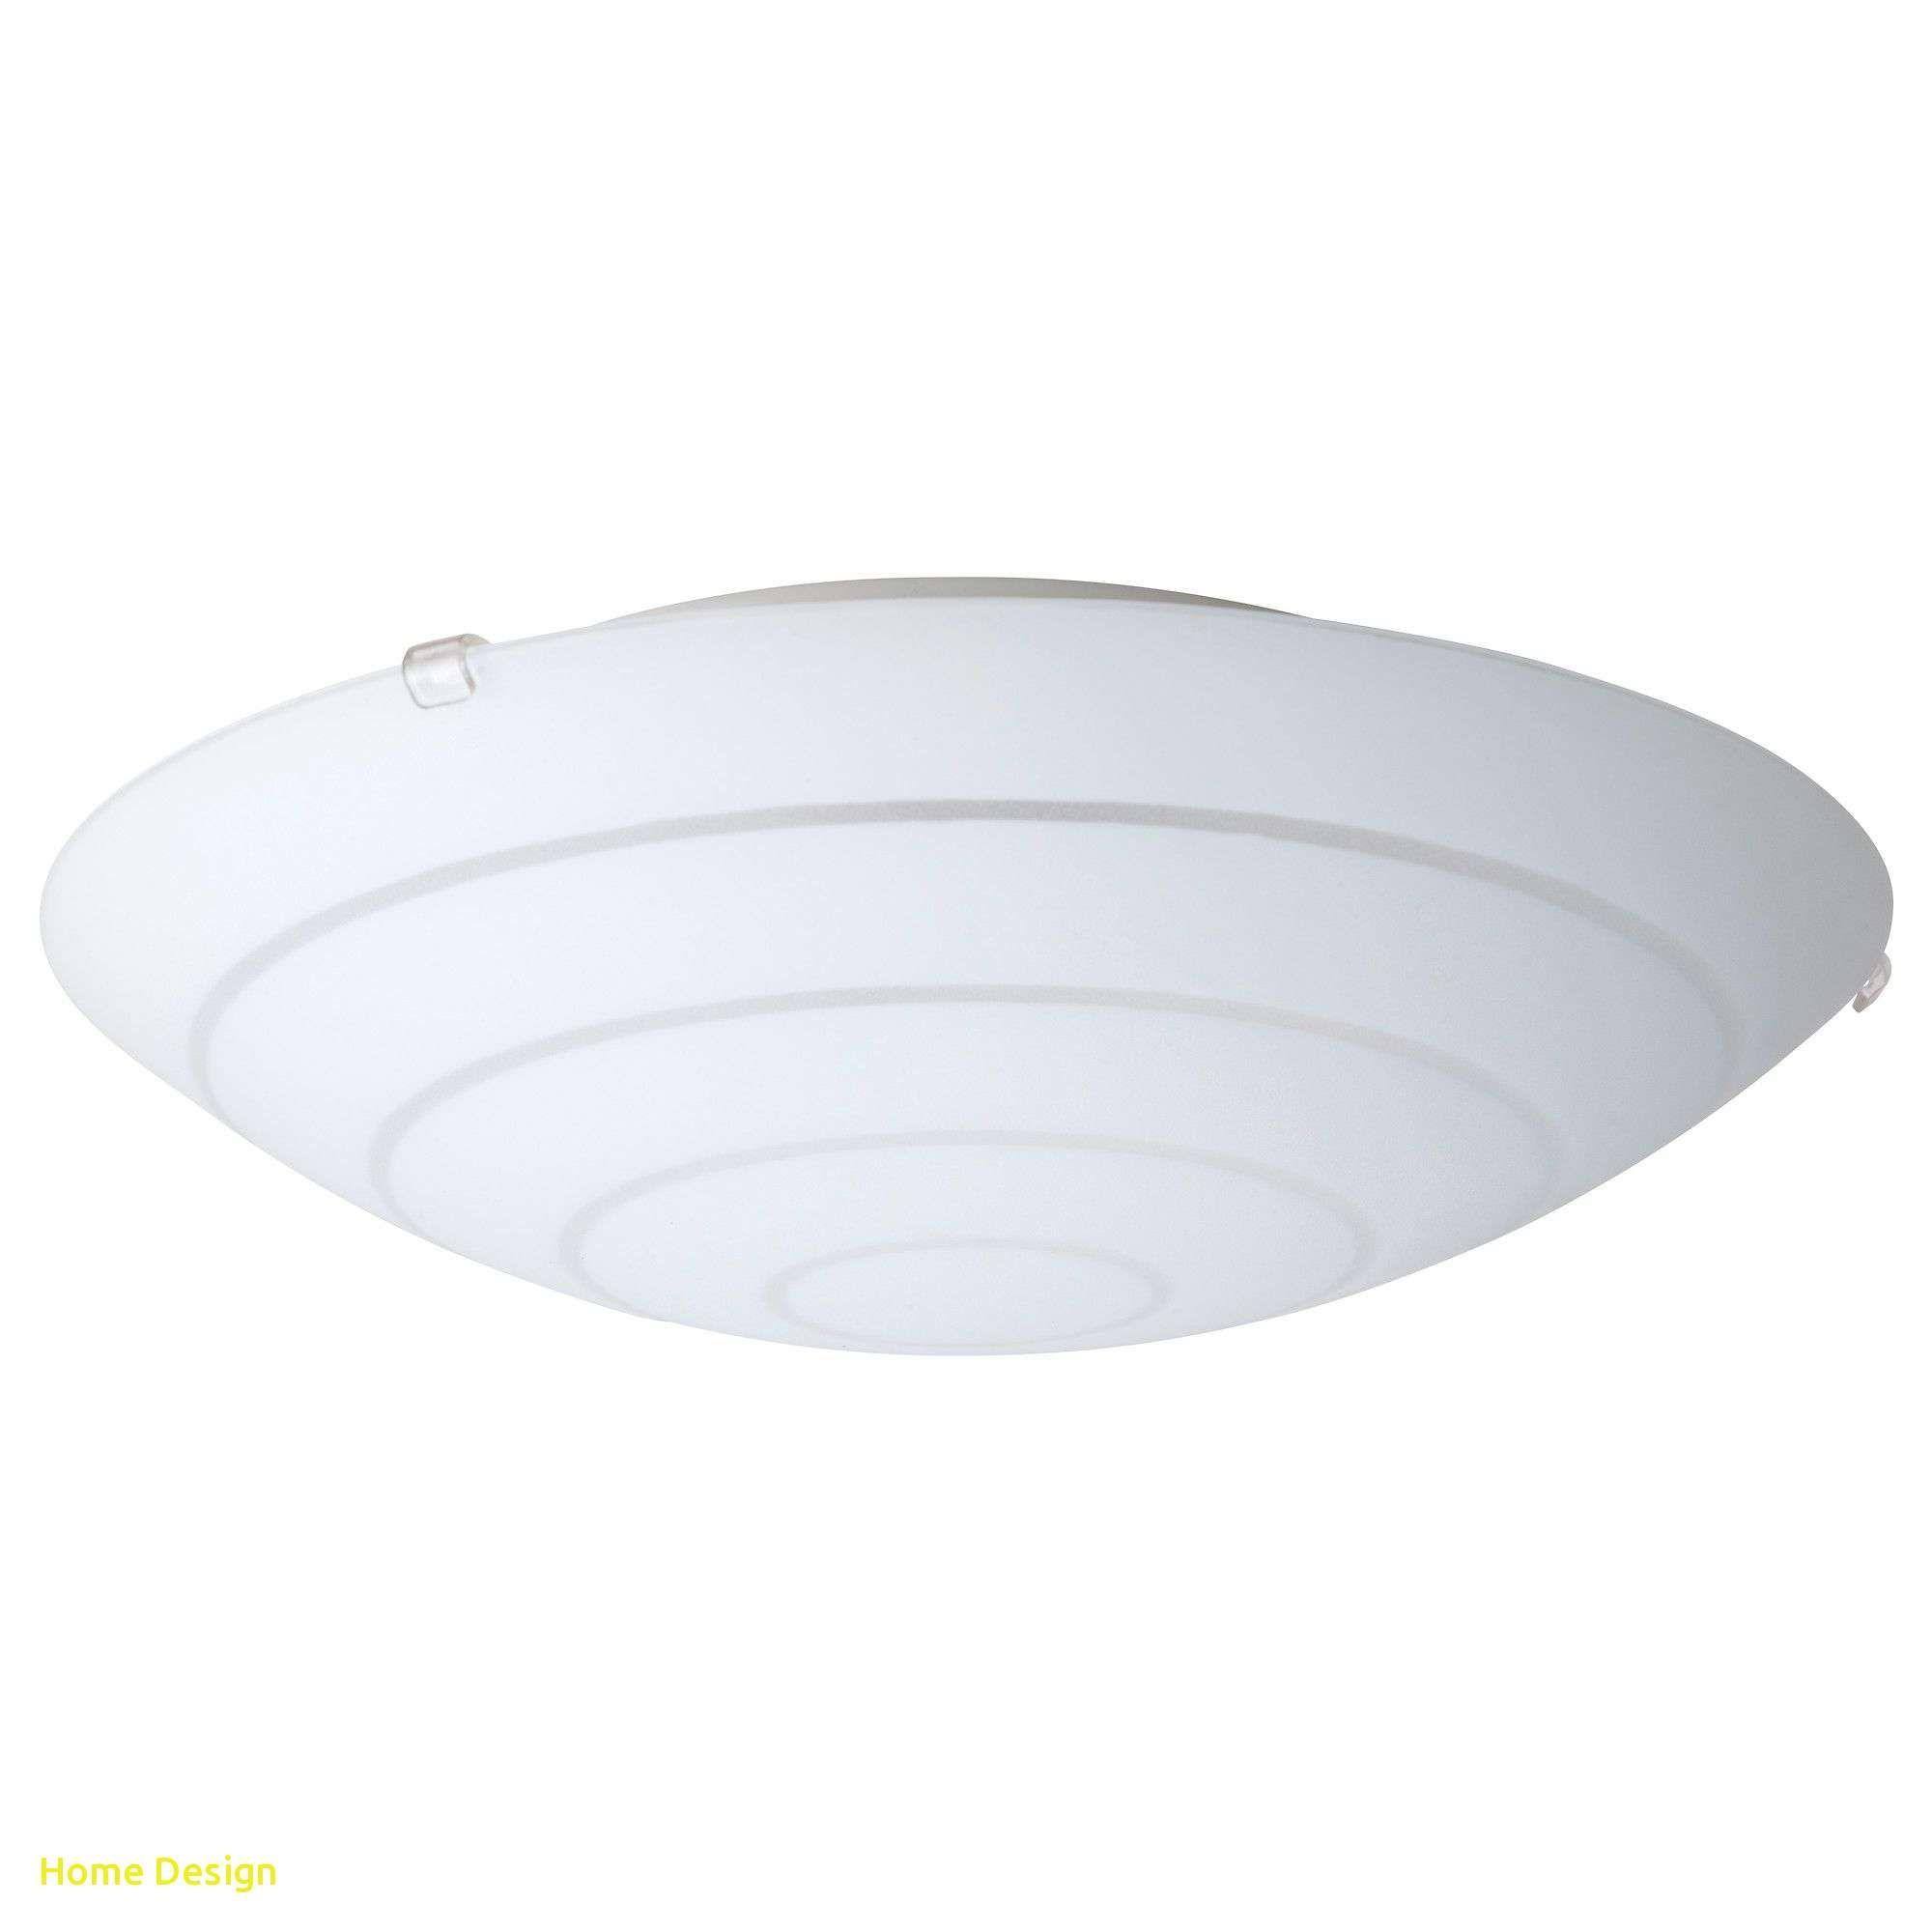 Luxury Hyby Ceiling Lamp Installation #homeDesign #HomeDecor